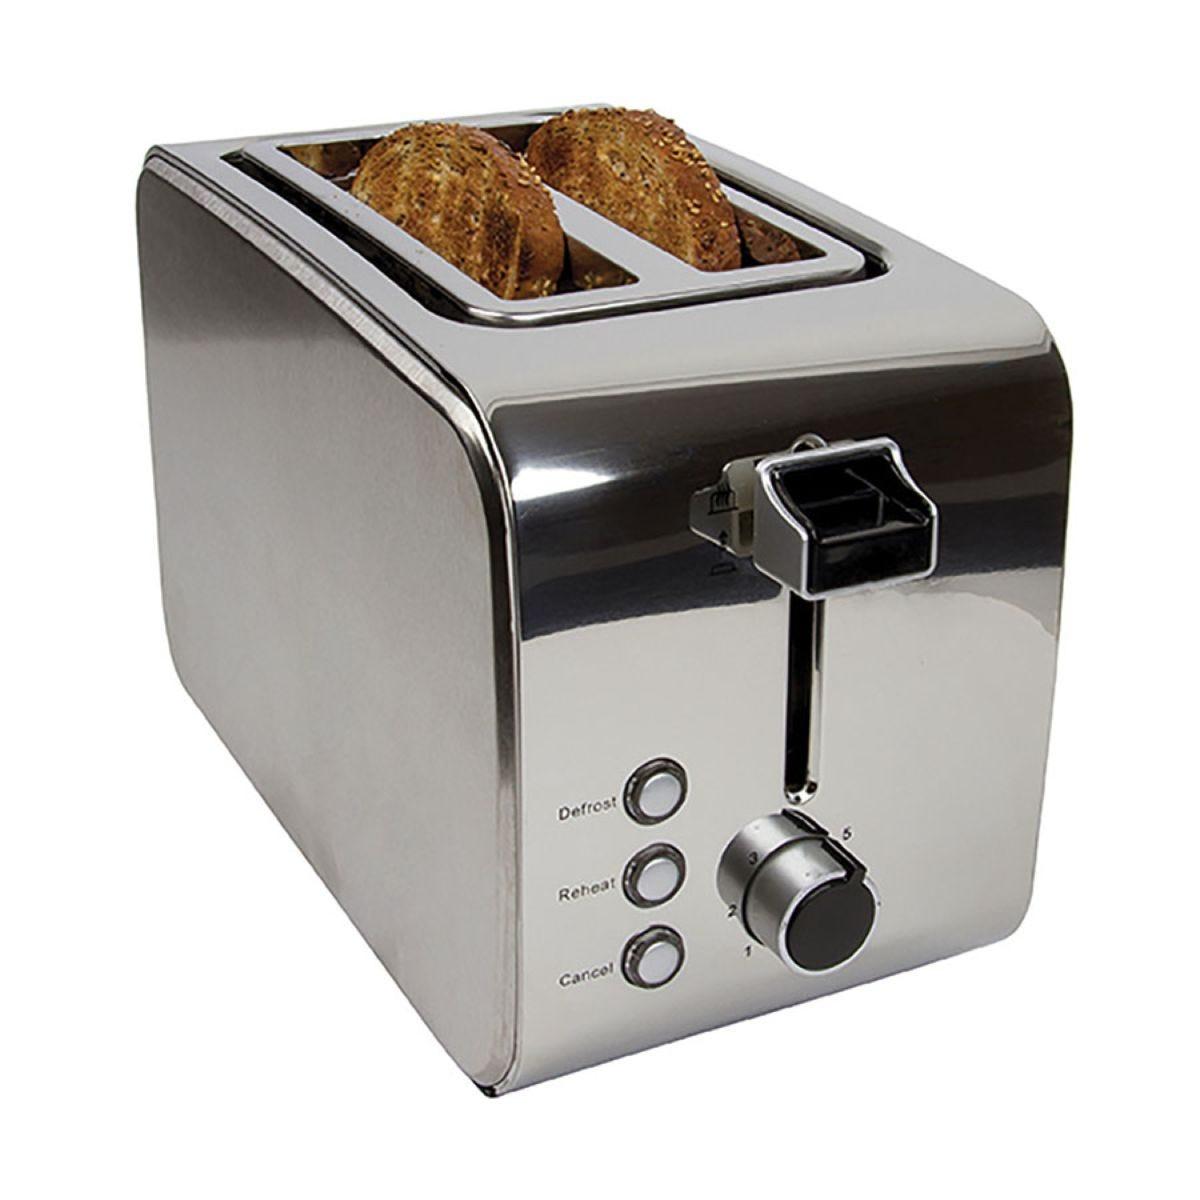 Igenix IG3202 2–Slice 850W Toaster – Stainless Steel